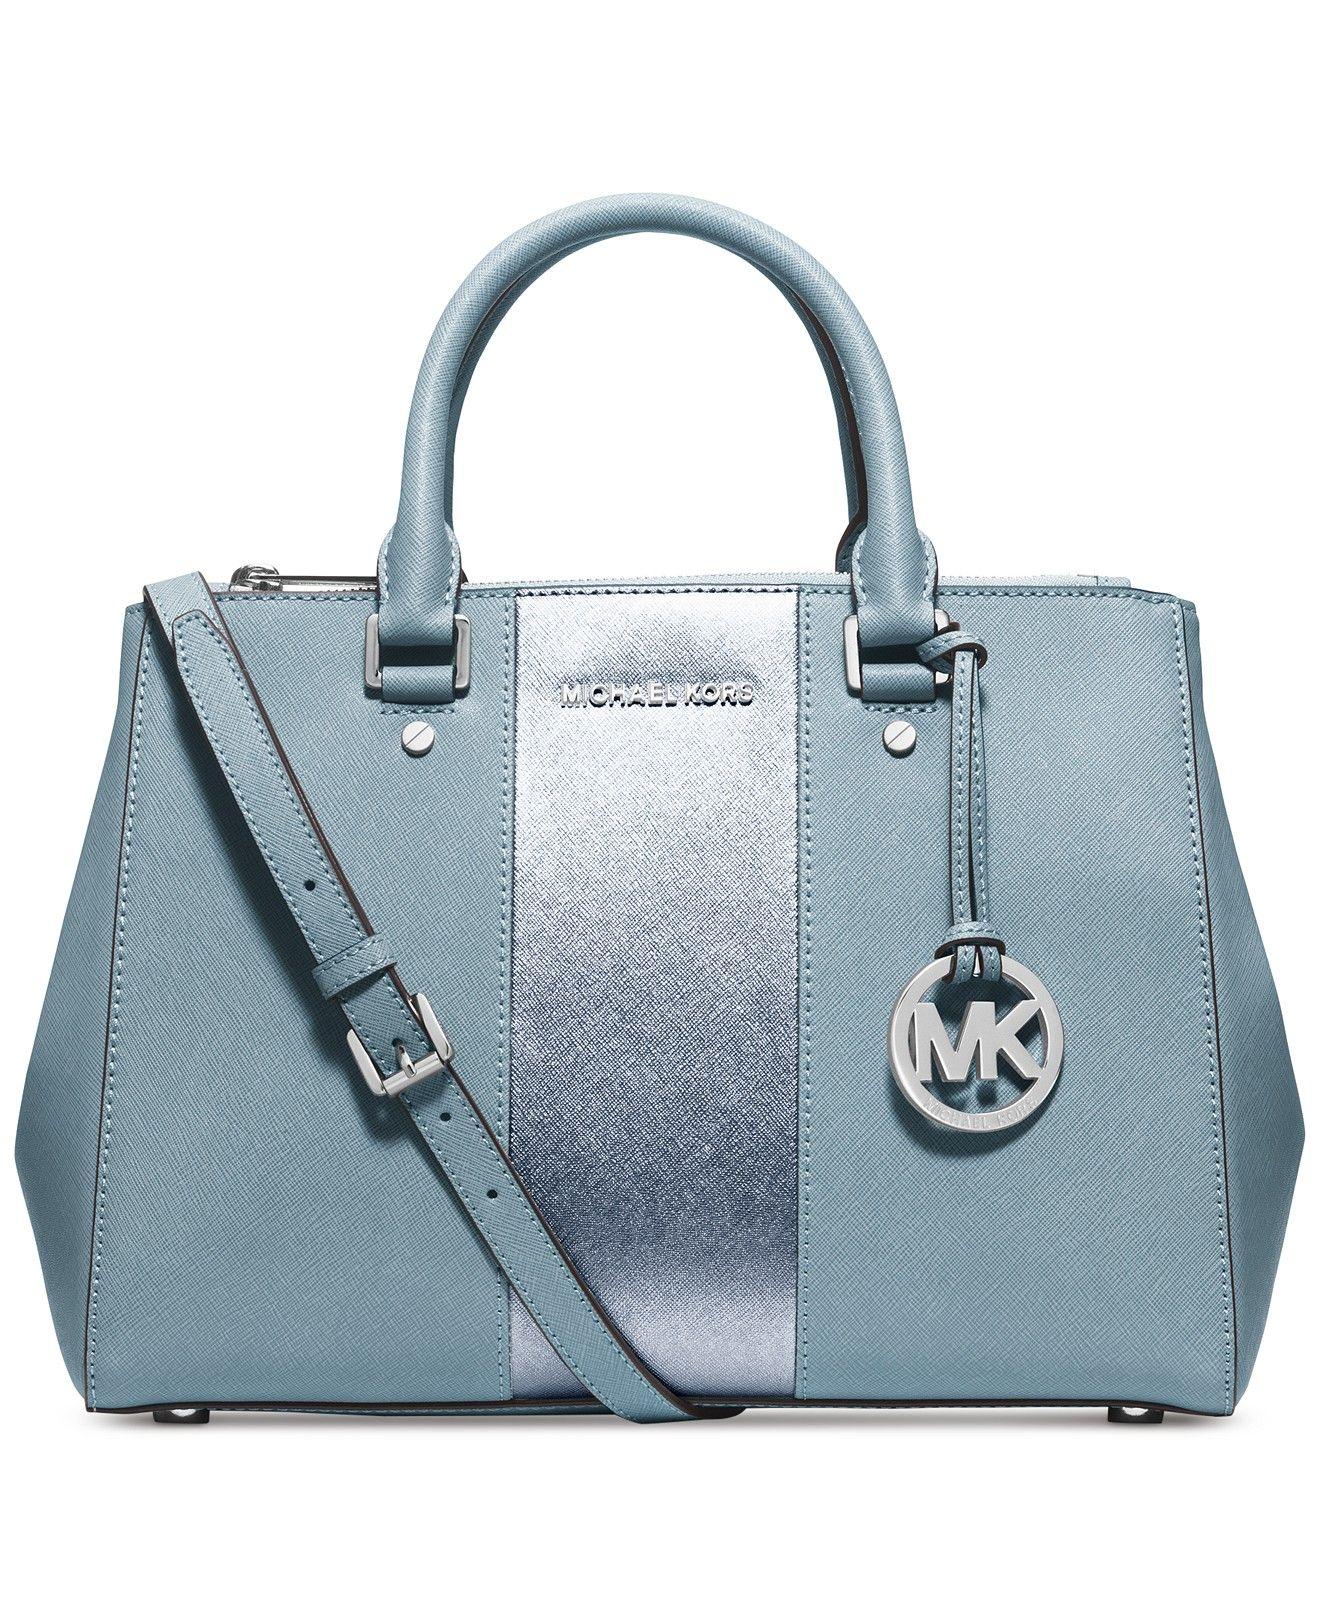 07e2fa901205 MICHAEL Michael Kors Sutton Stripe Medium Satchel - Handbags & Accessories  - Macy's